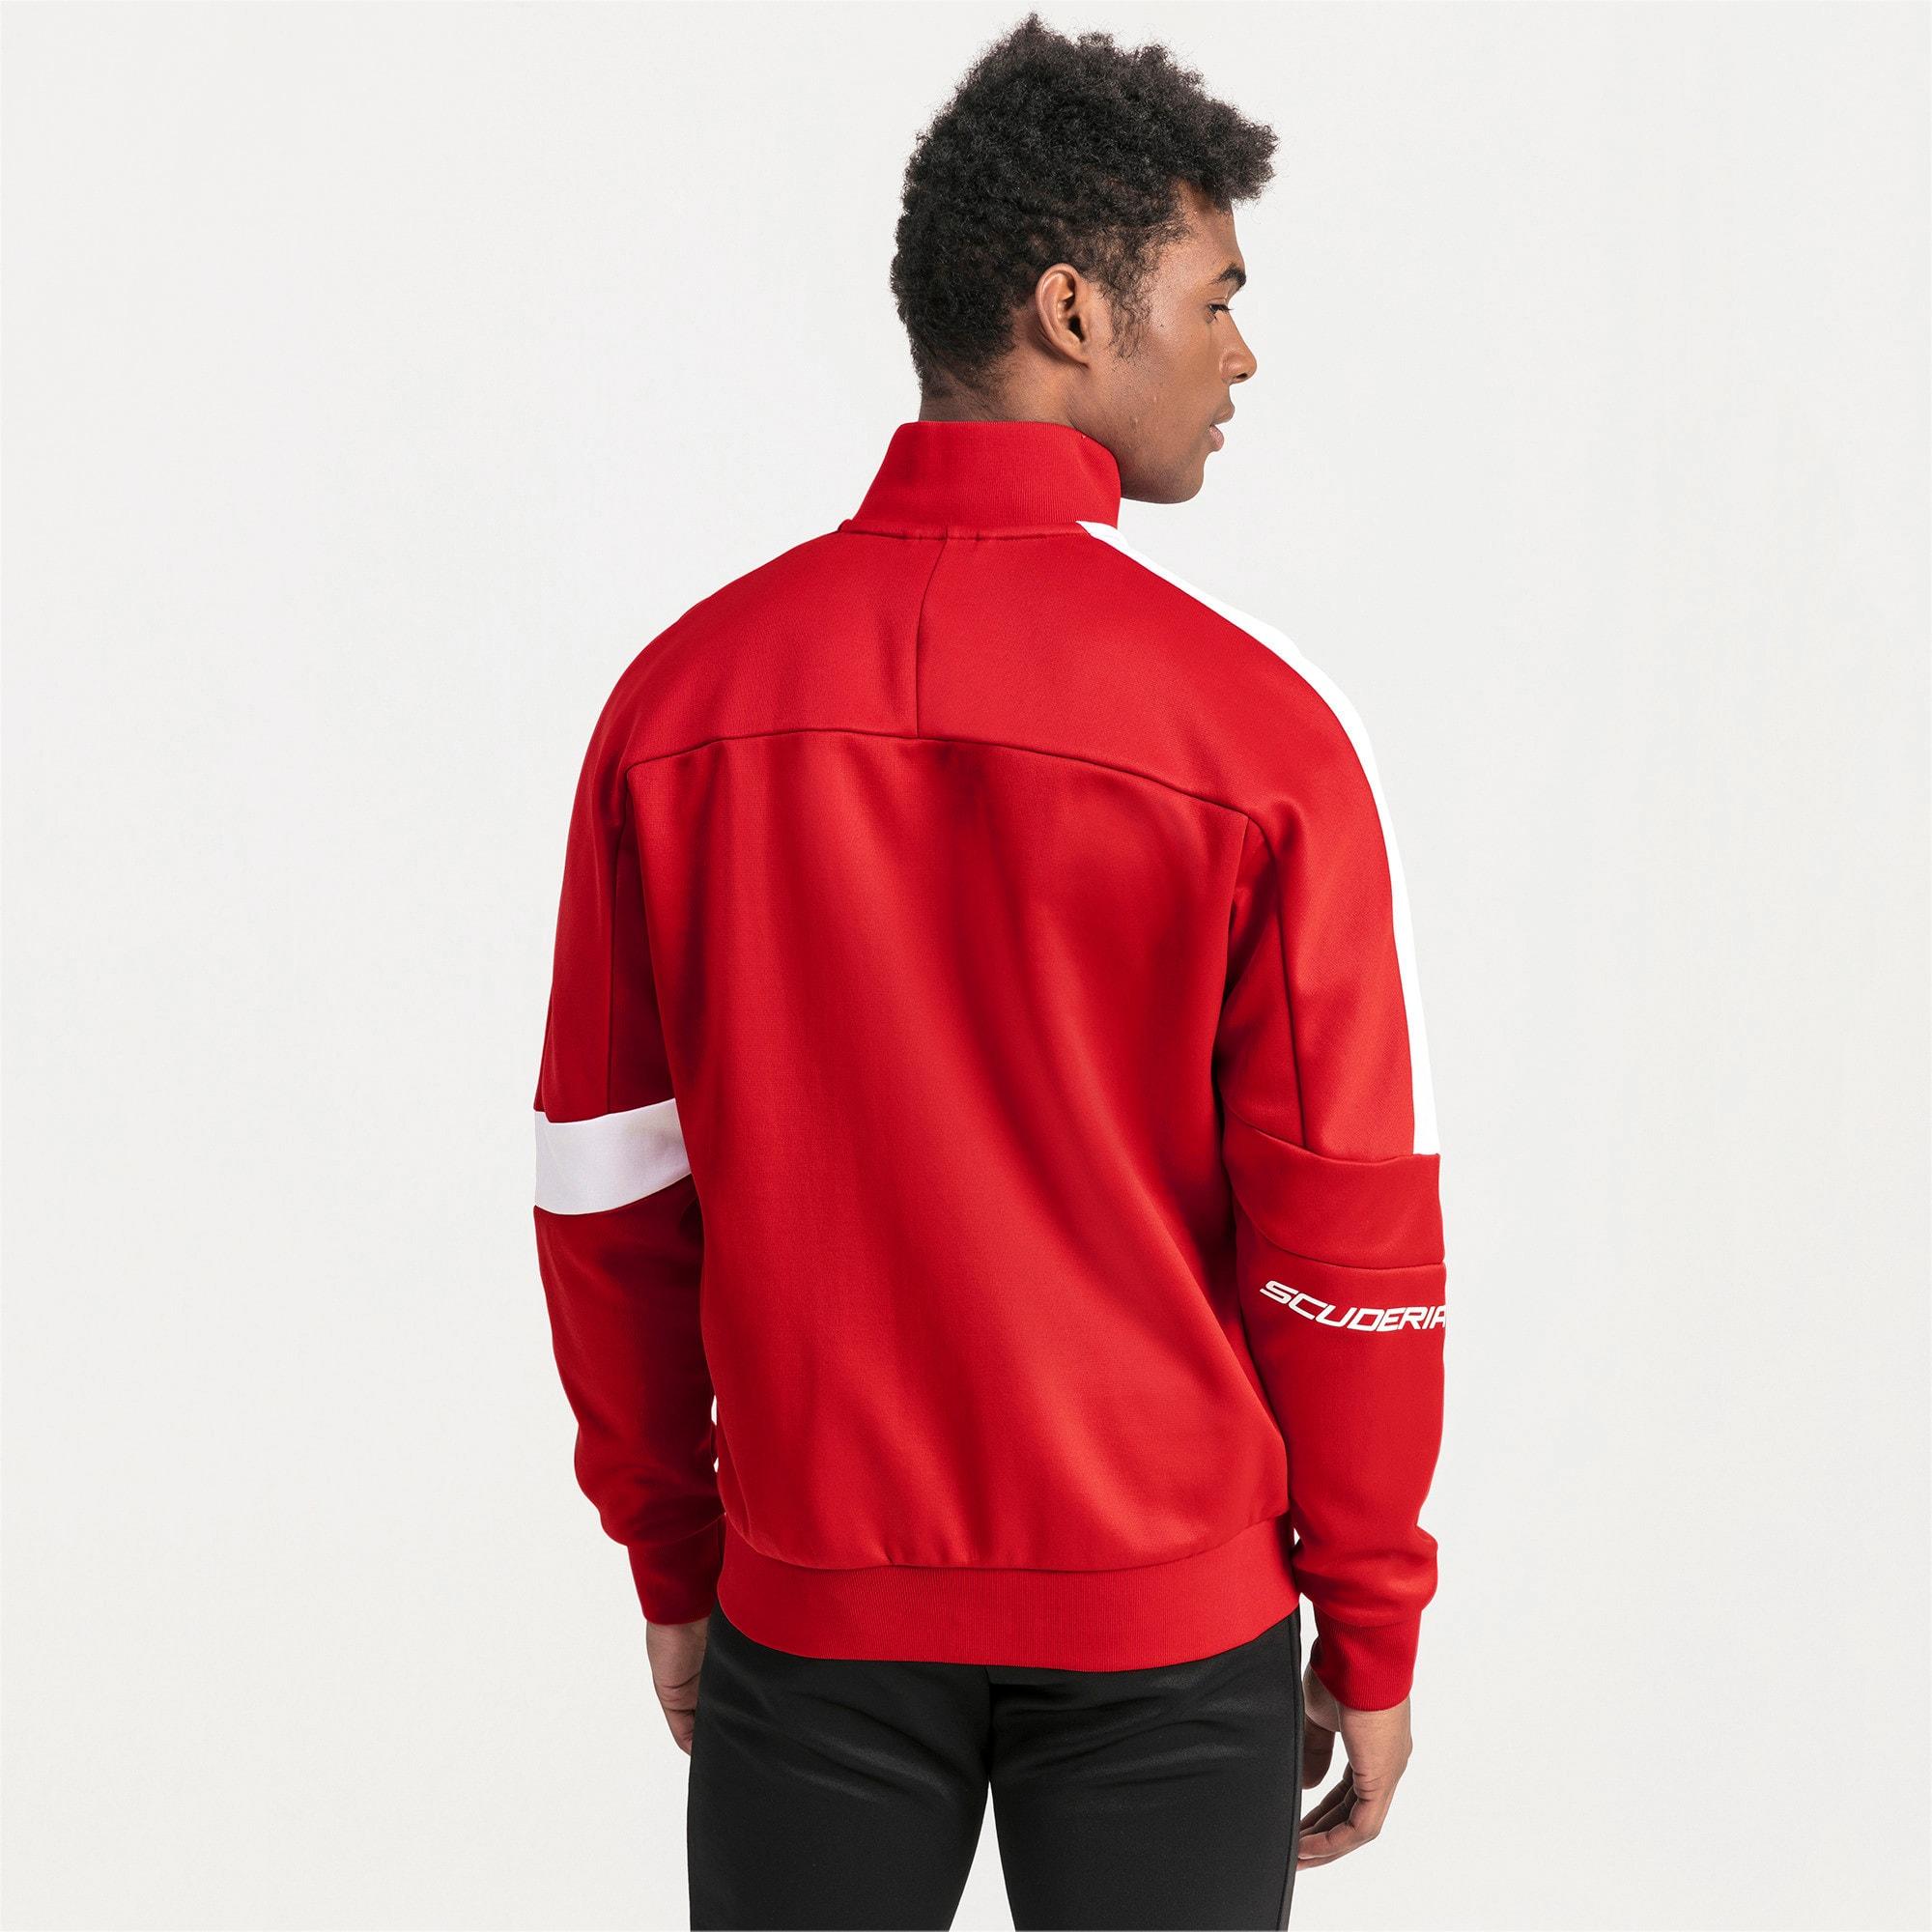 Thumbnail 2 of Ferrari T7 Men's Track Jacket, Rosso Corsa, medium